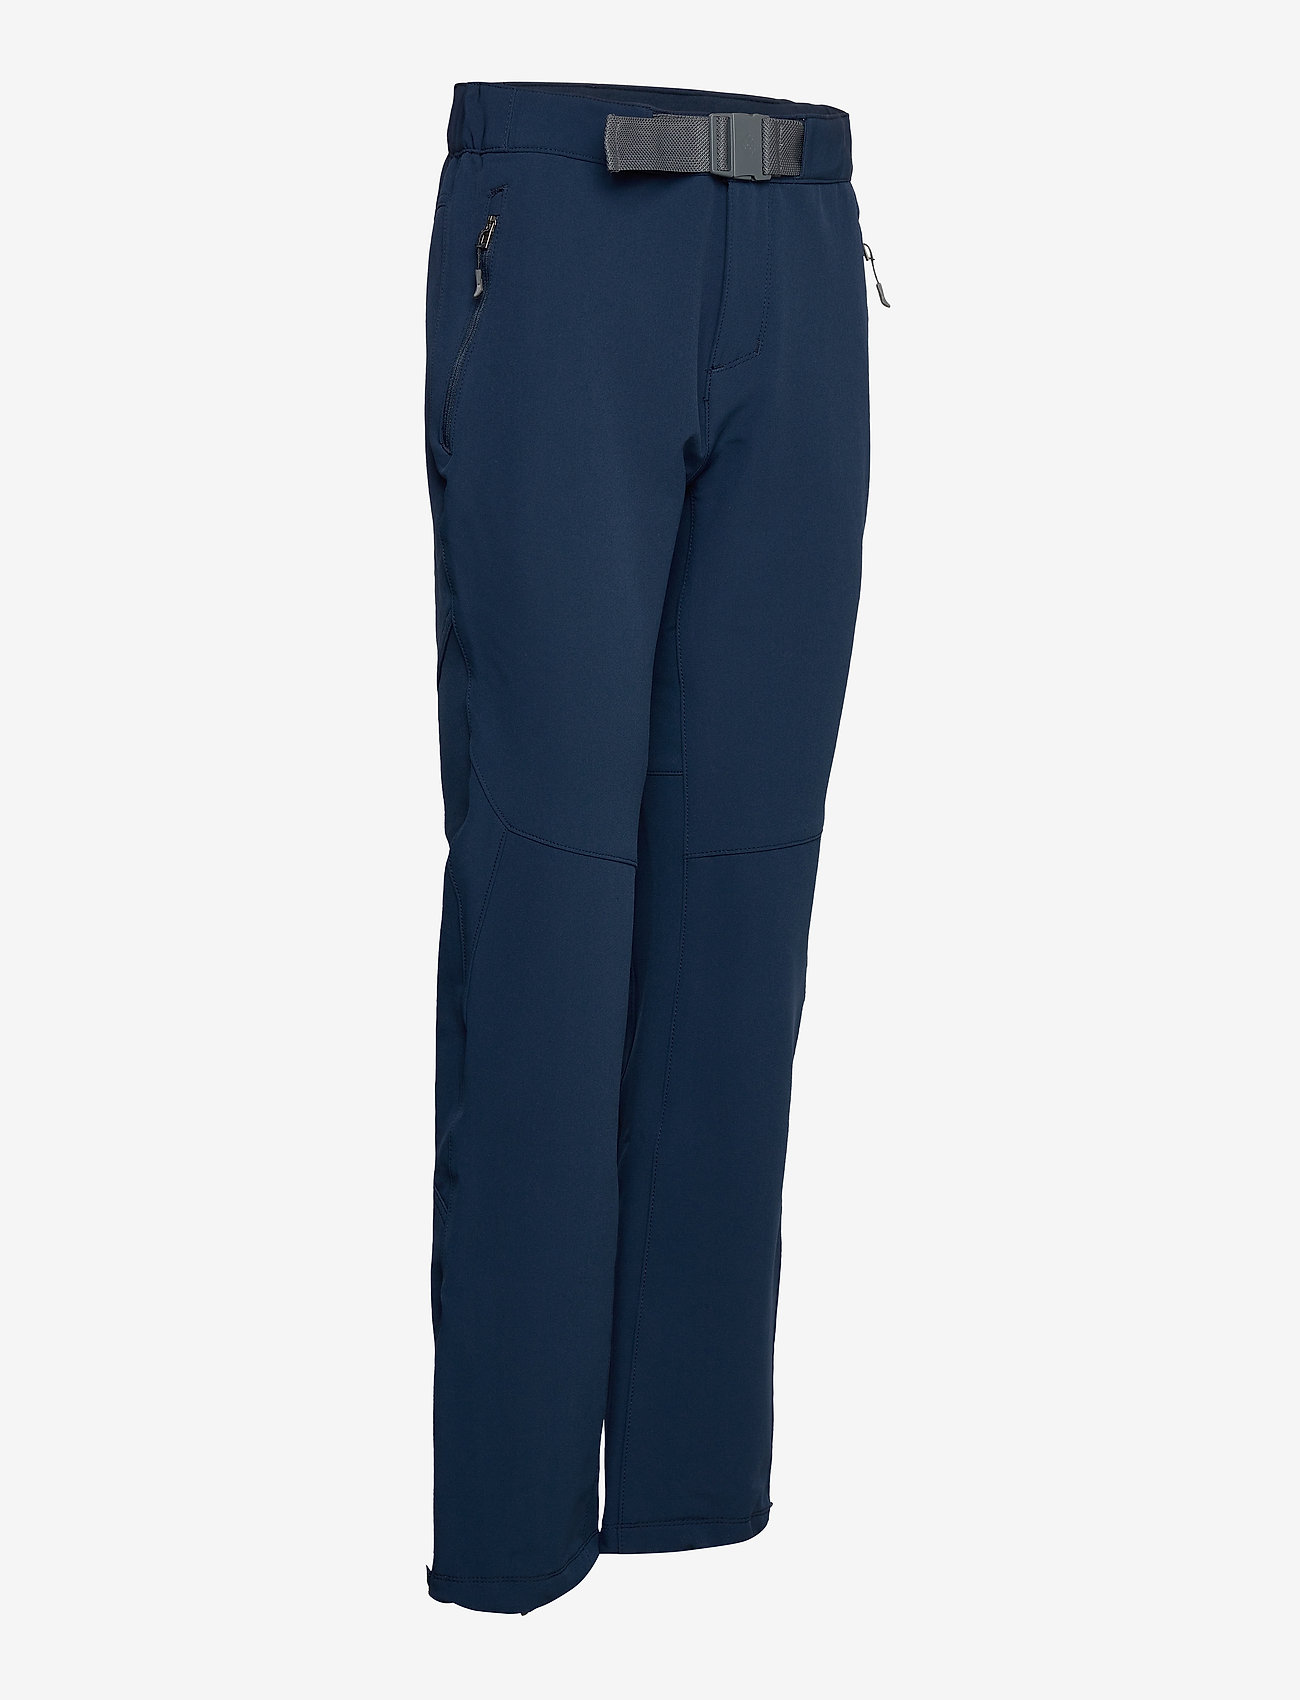 Columbia - Passo Alto II Heat Pant - spodnie turystyczne - collegiate navy - 1